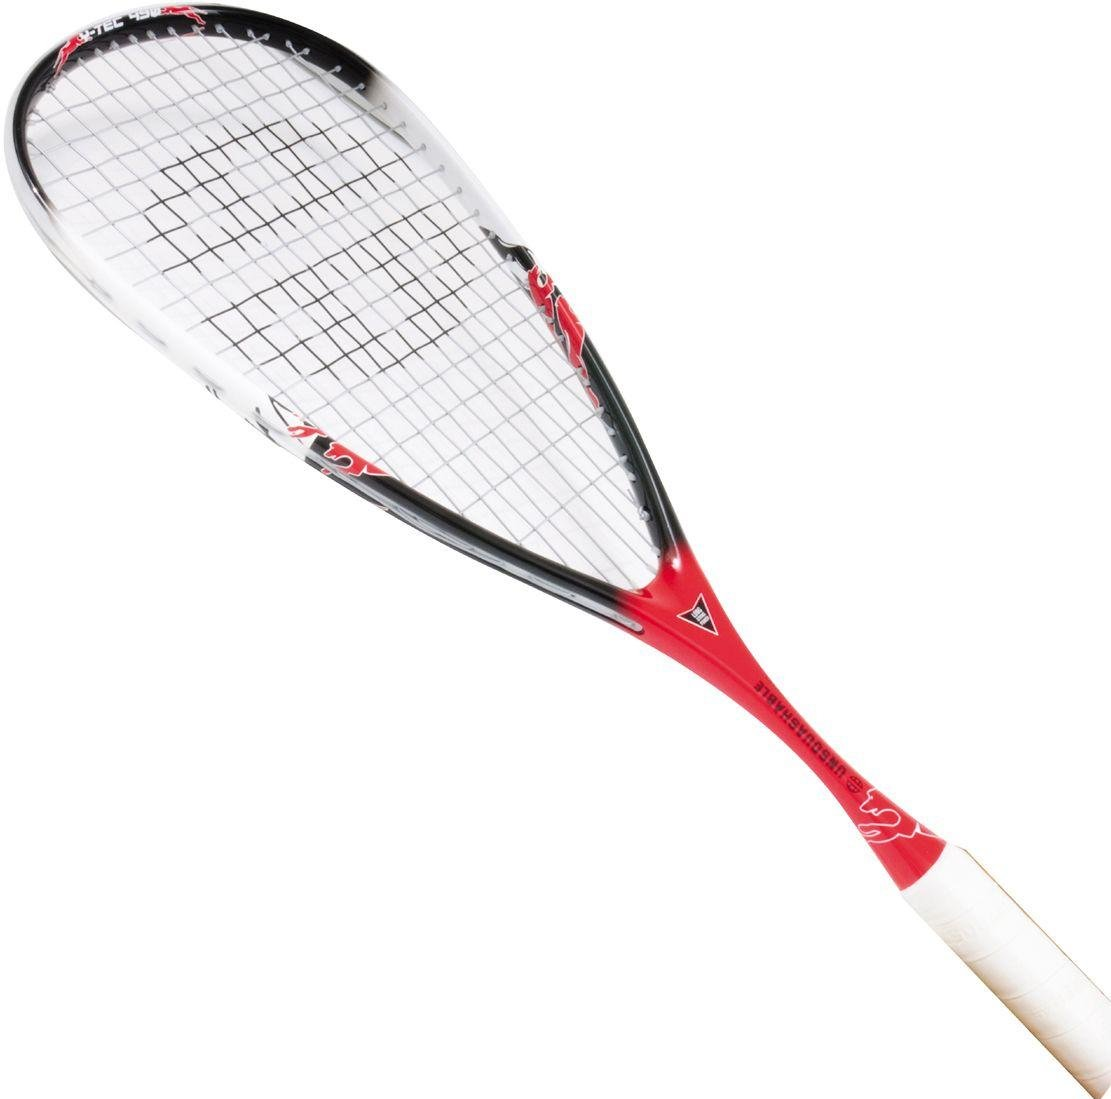 Unsquashable Y-Tec 490 Squash Racket lowest price